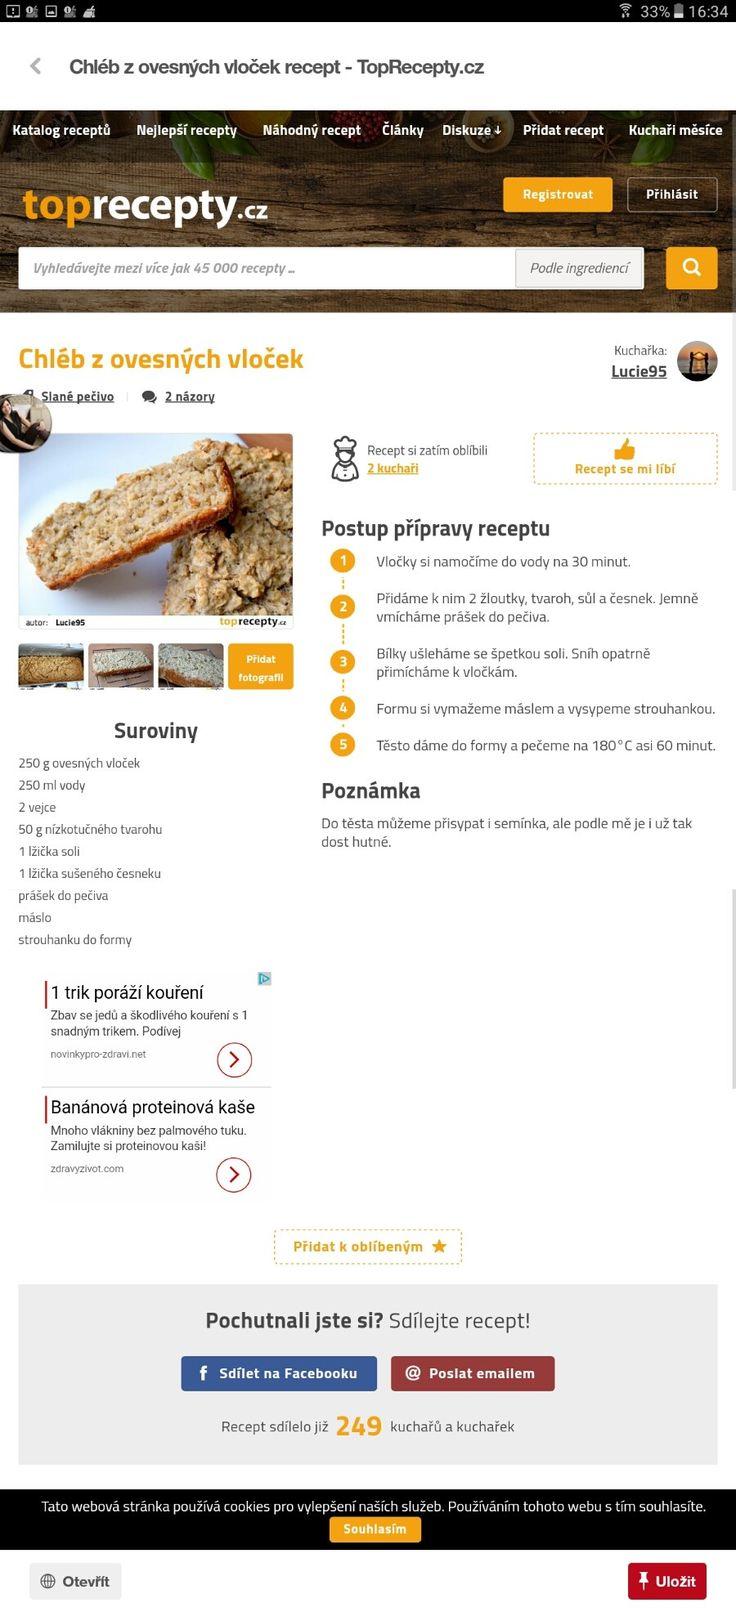 Chleb s ovesnych vlocek